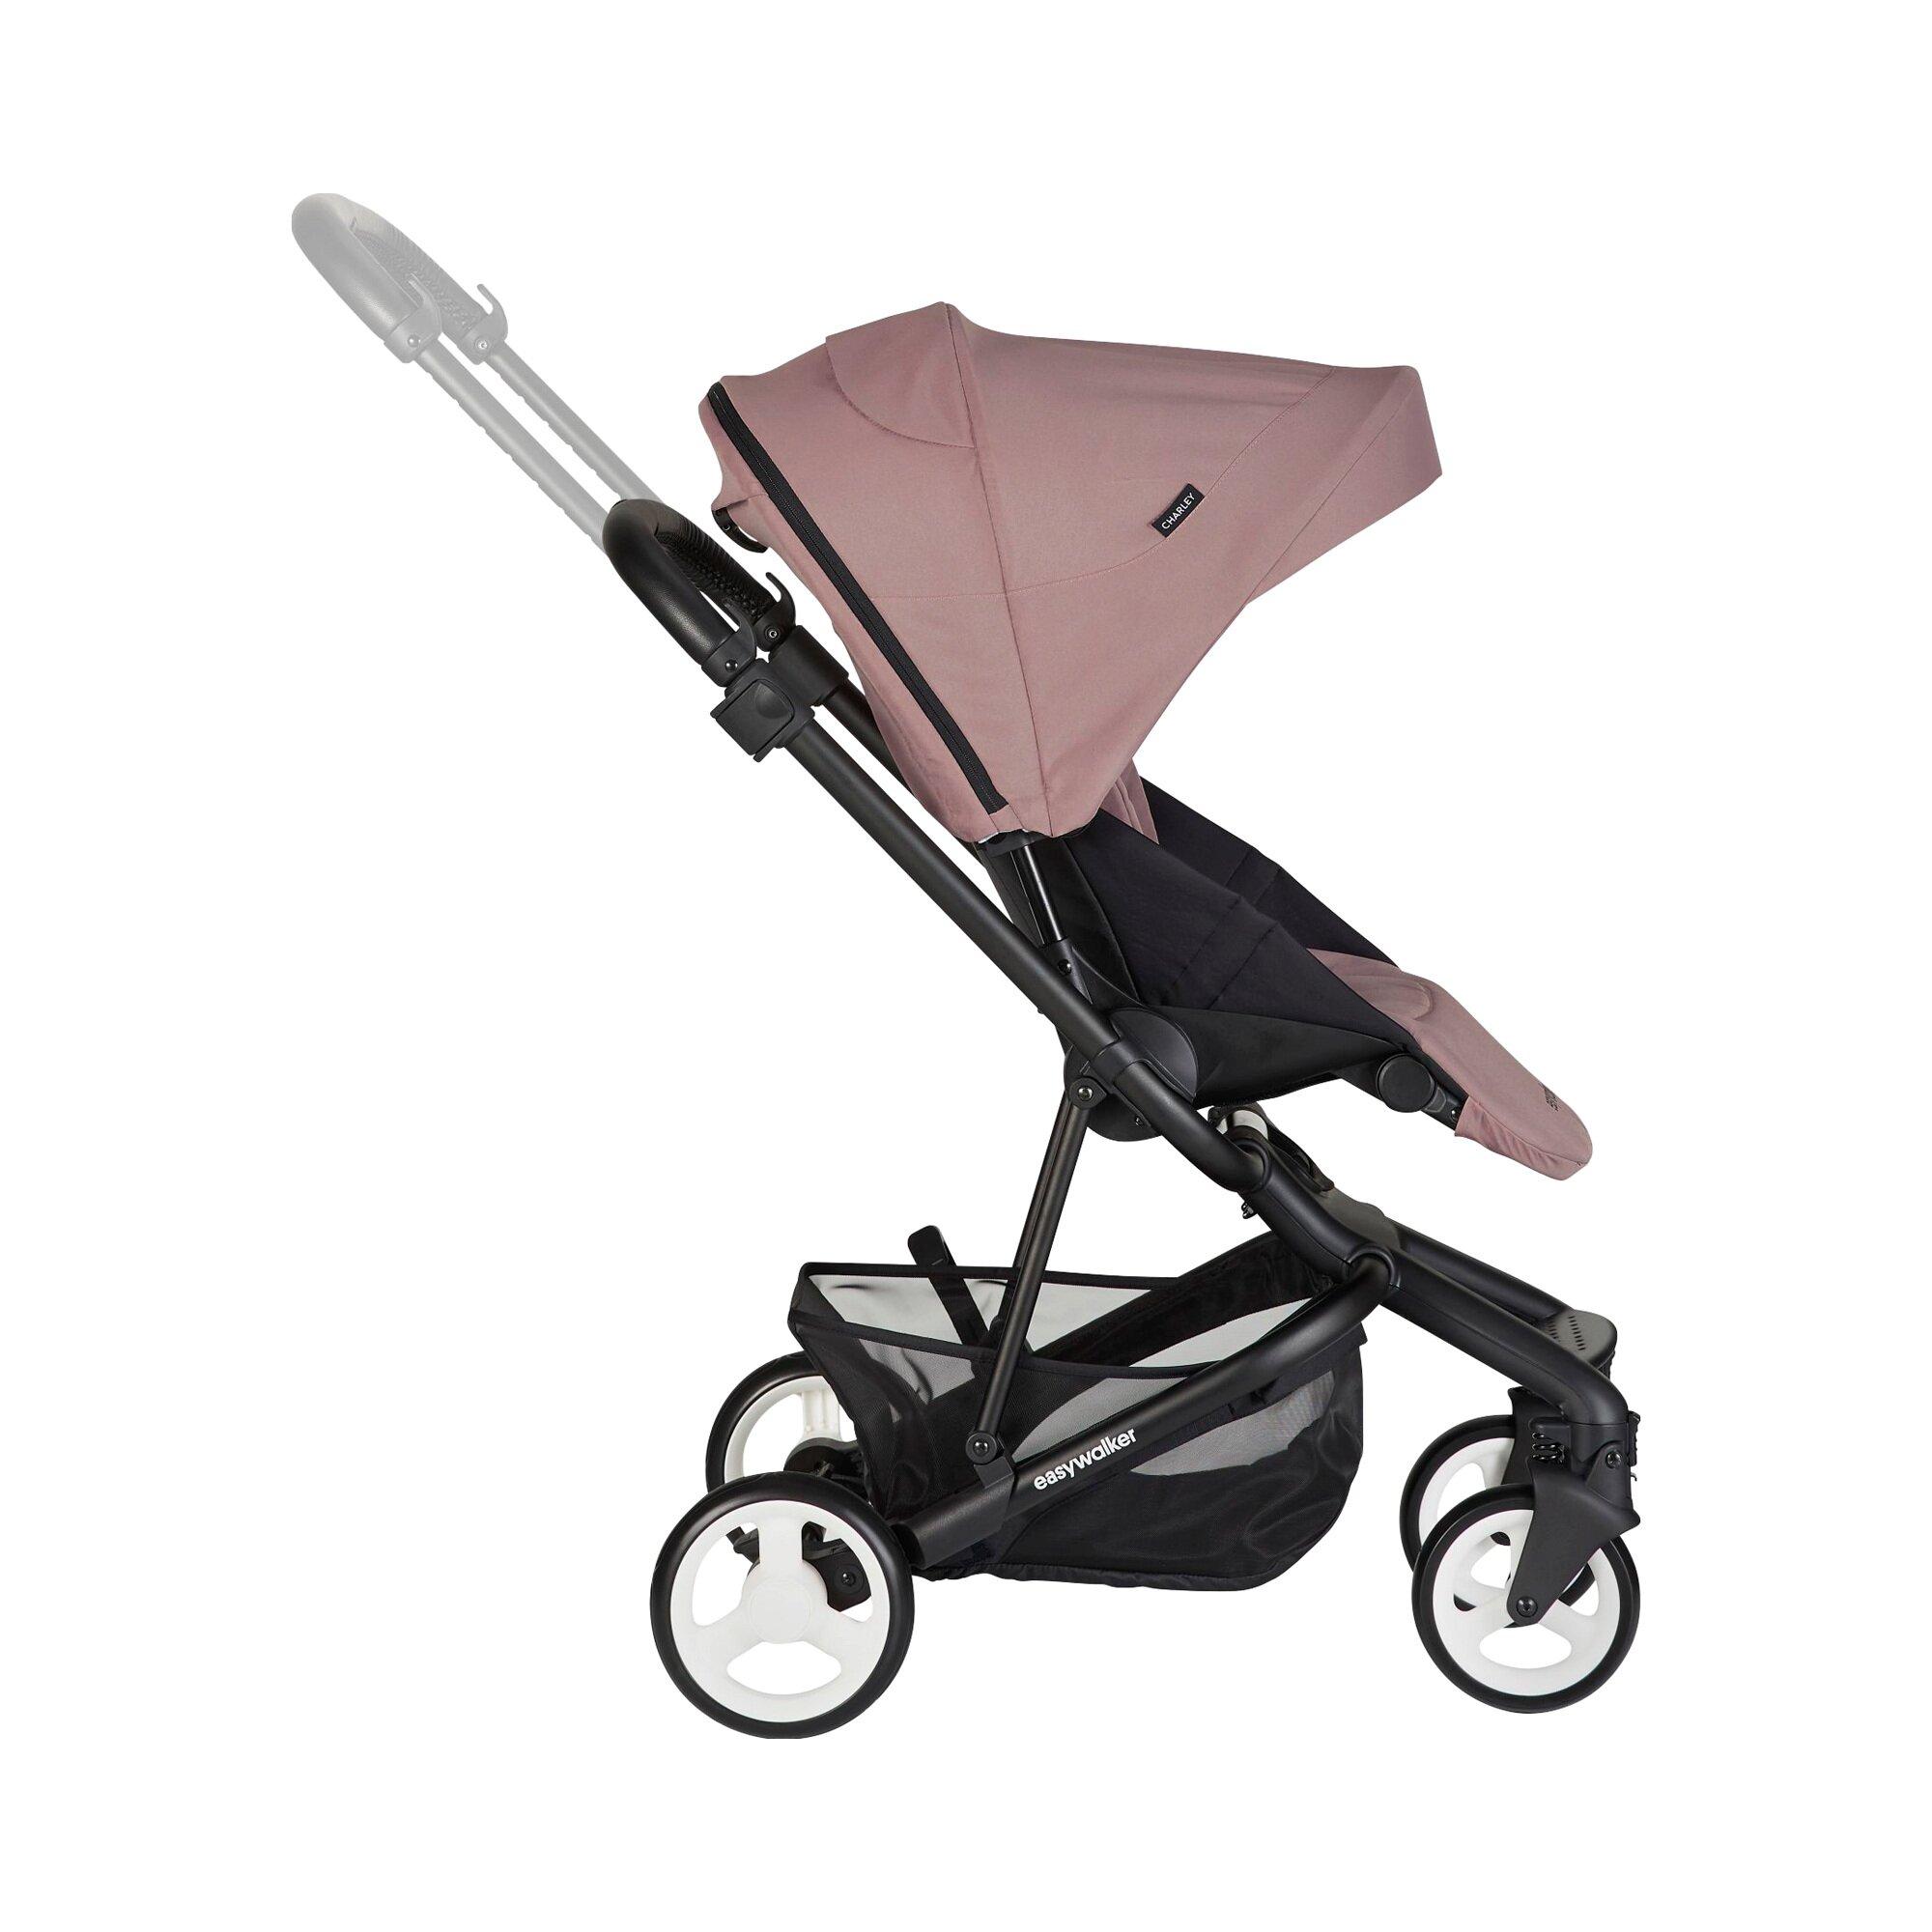 easywalker-charley-kinderwagen-pink